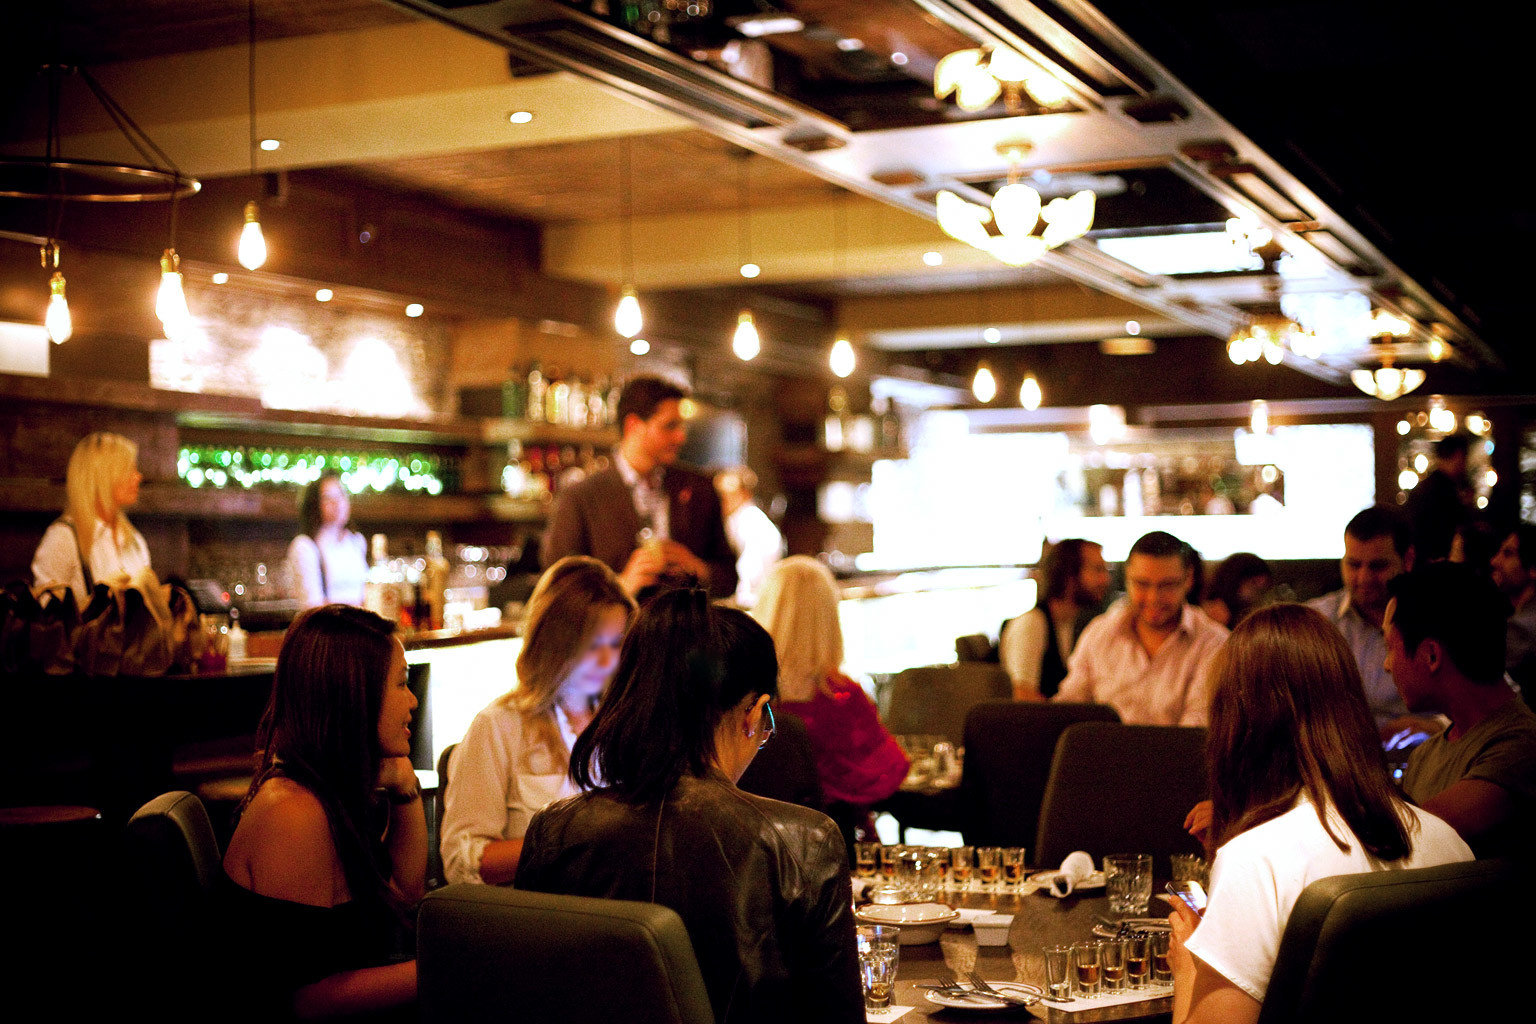 Bar Dining Drink Eat Elegant Luxury Nightlife restaurant sense crowd